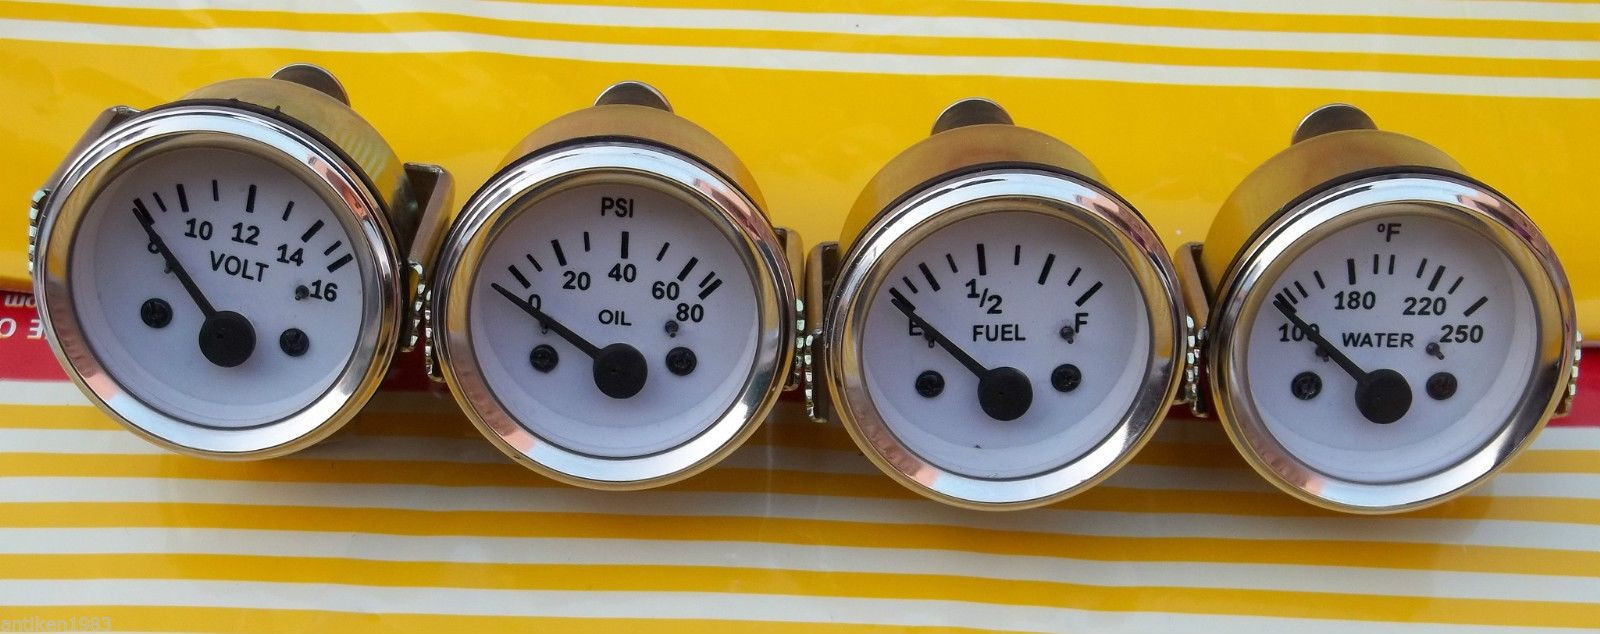 2 52mm Electrical Oil Pressure Temperature Volt Fuel Gauge Vdo Clock Wiring Diagram White Face Motors Parts Accessories Type